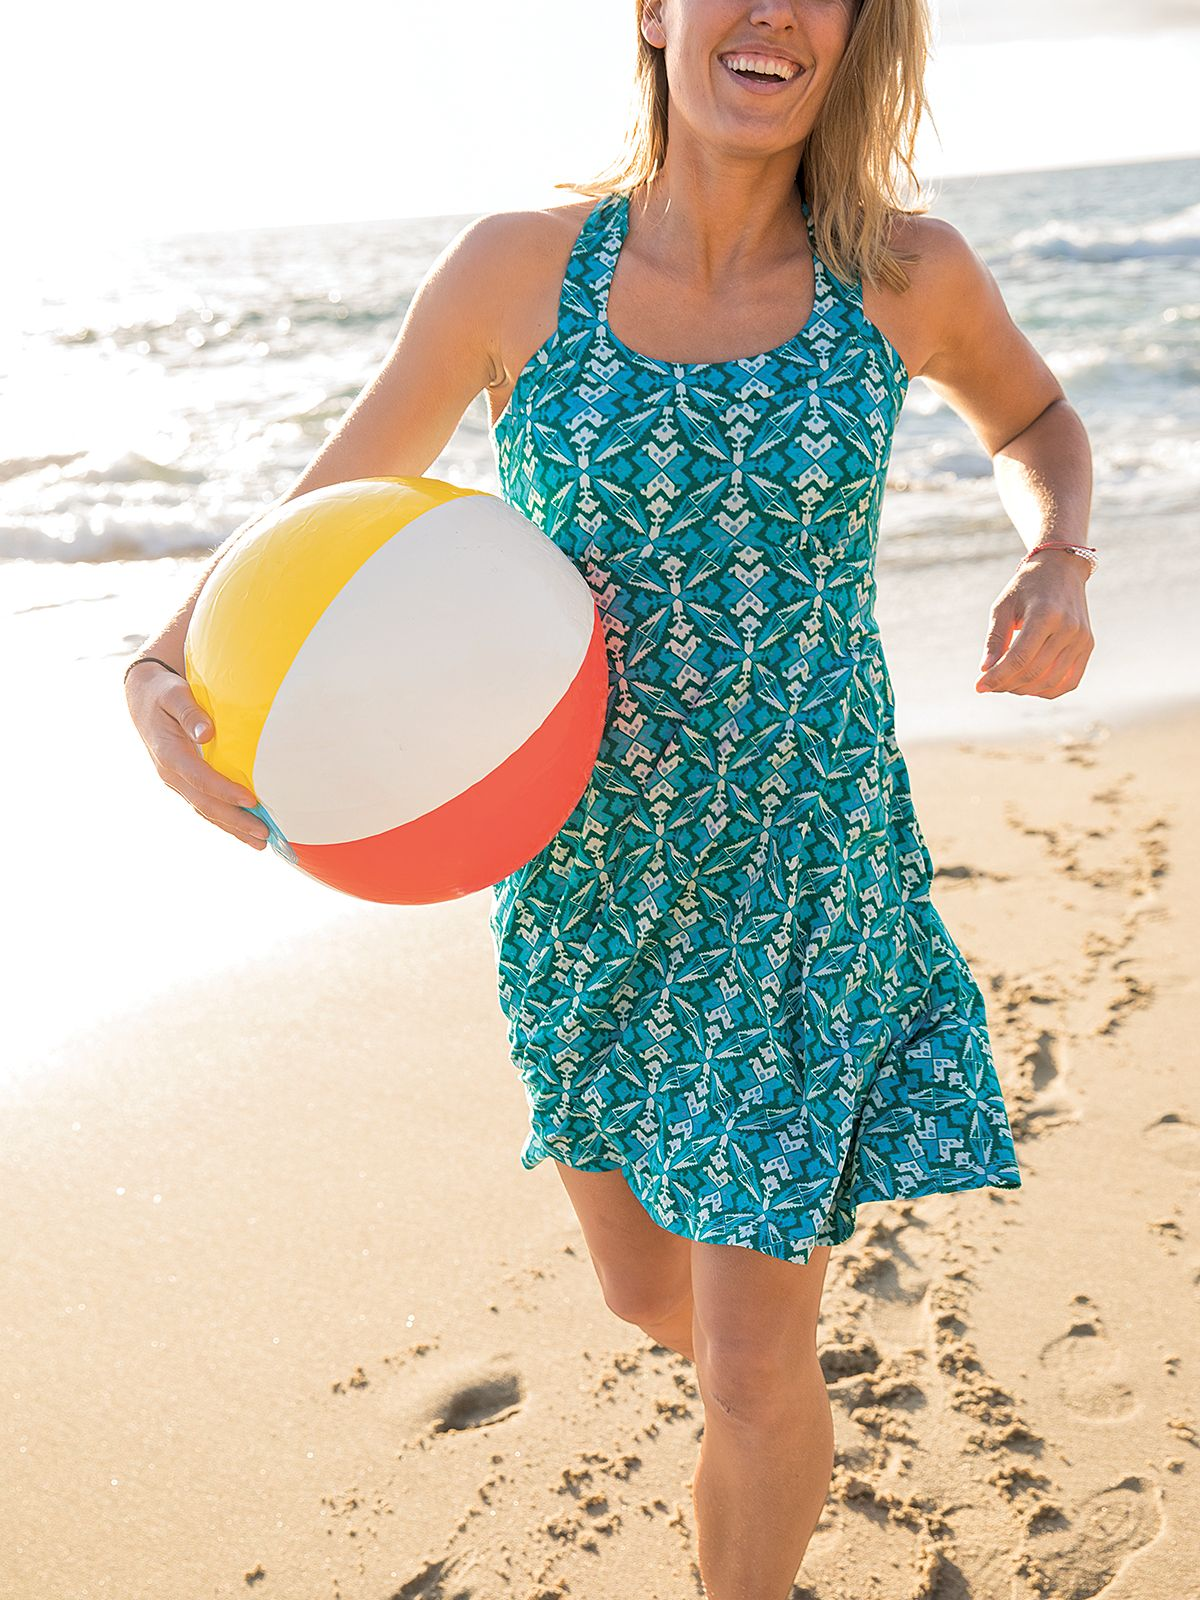 Vera Dress Geode Title Nine T9 Ix Silky Cool Soothing Built In Shelf Bra Removable Modesty Droptail He Athletic Dresses Modest Swimwear Travel Dress [ 1600 x 1200 Pixel ]